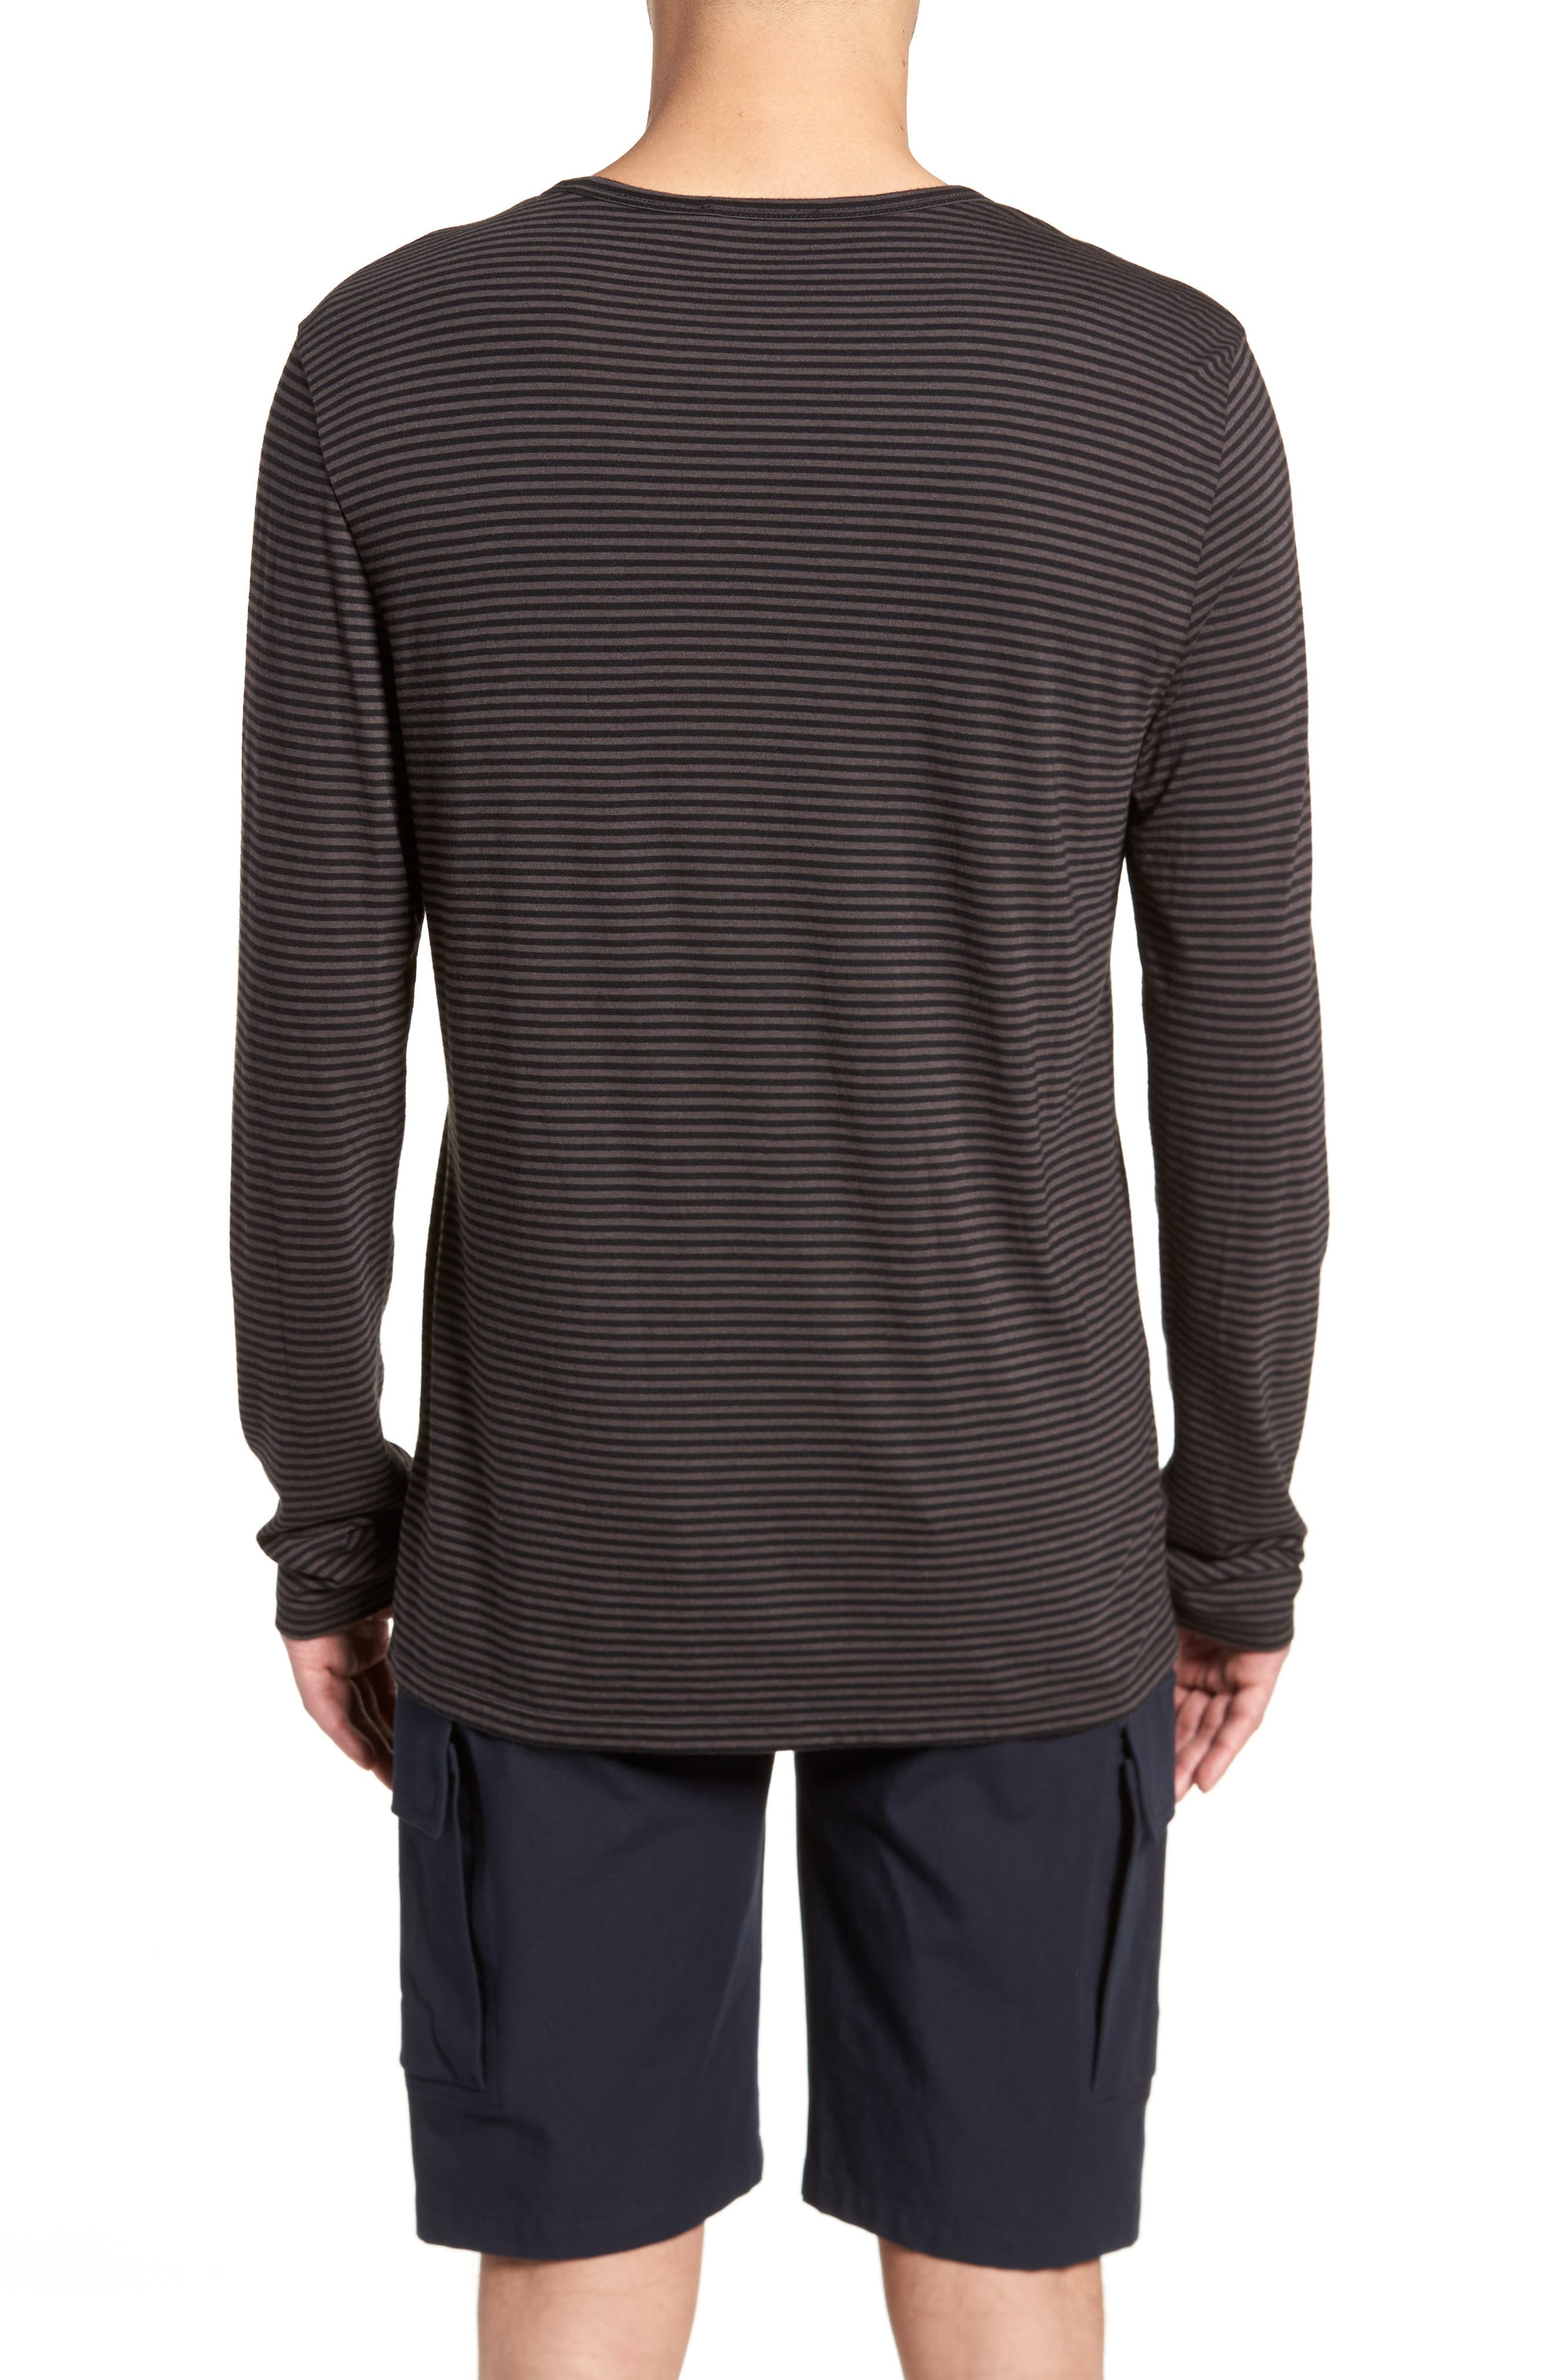 Feeder Stripe Long Sleeve Shirt,                             Alternate thumbnail 2, color,                             Black/ Stone Grey